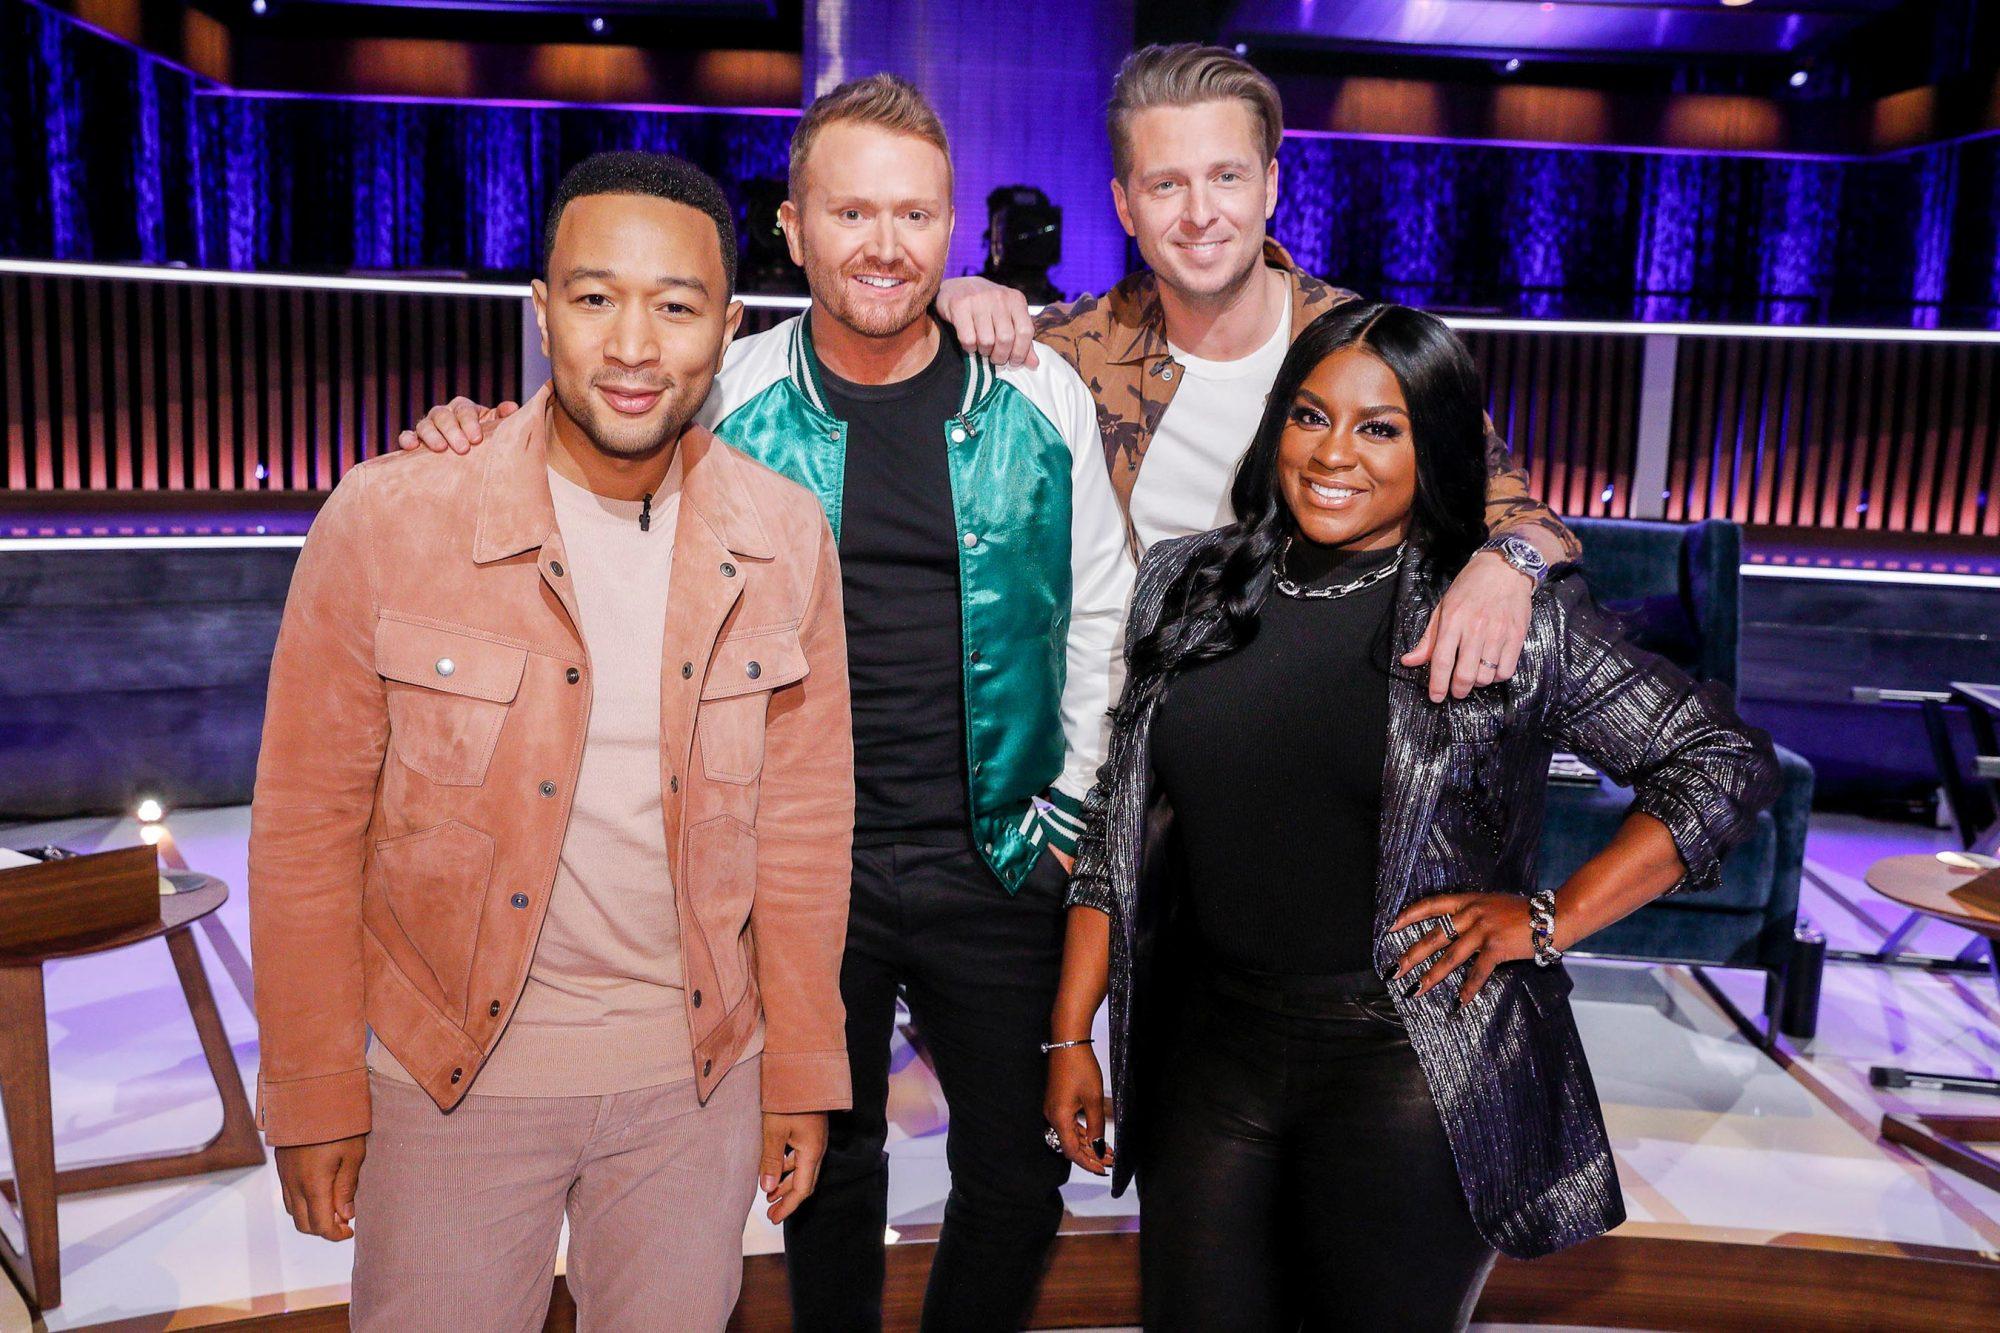 SONGLAND -- Episode X -- Pictured: (l-r) John Legend, Shane McAnally, Ryan Tedder, Ester Dean -- (Photo by: Trae Patton/NBC)